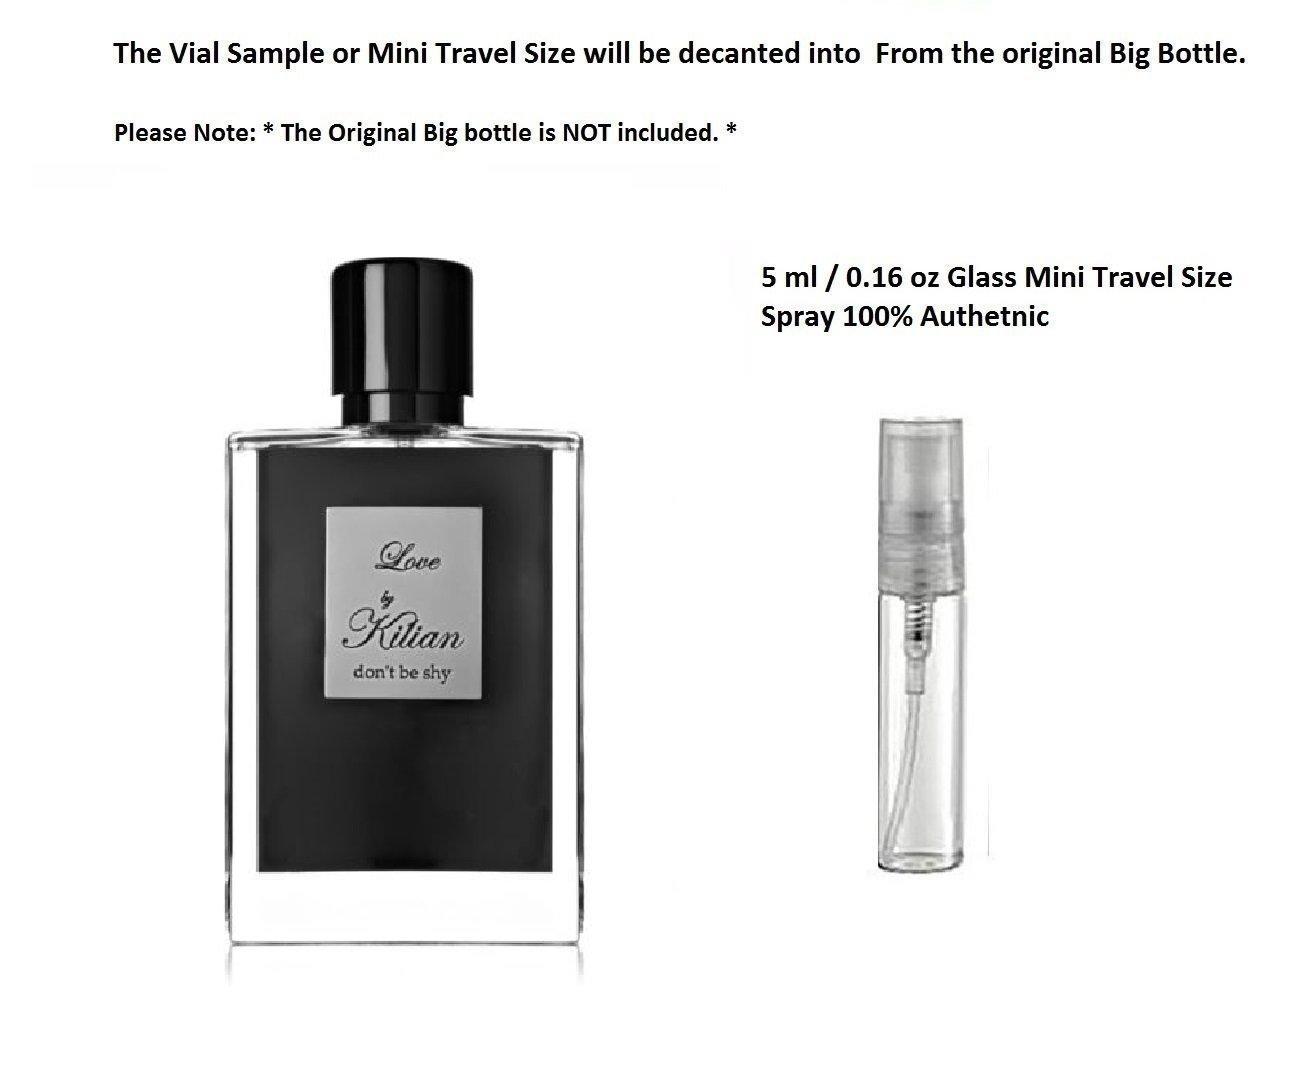 Kilian LOVE DON'T BE SHY 5 ml 0.16 oz EDP Glass Mini Travel Size spray Authentic